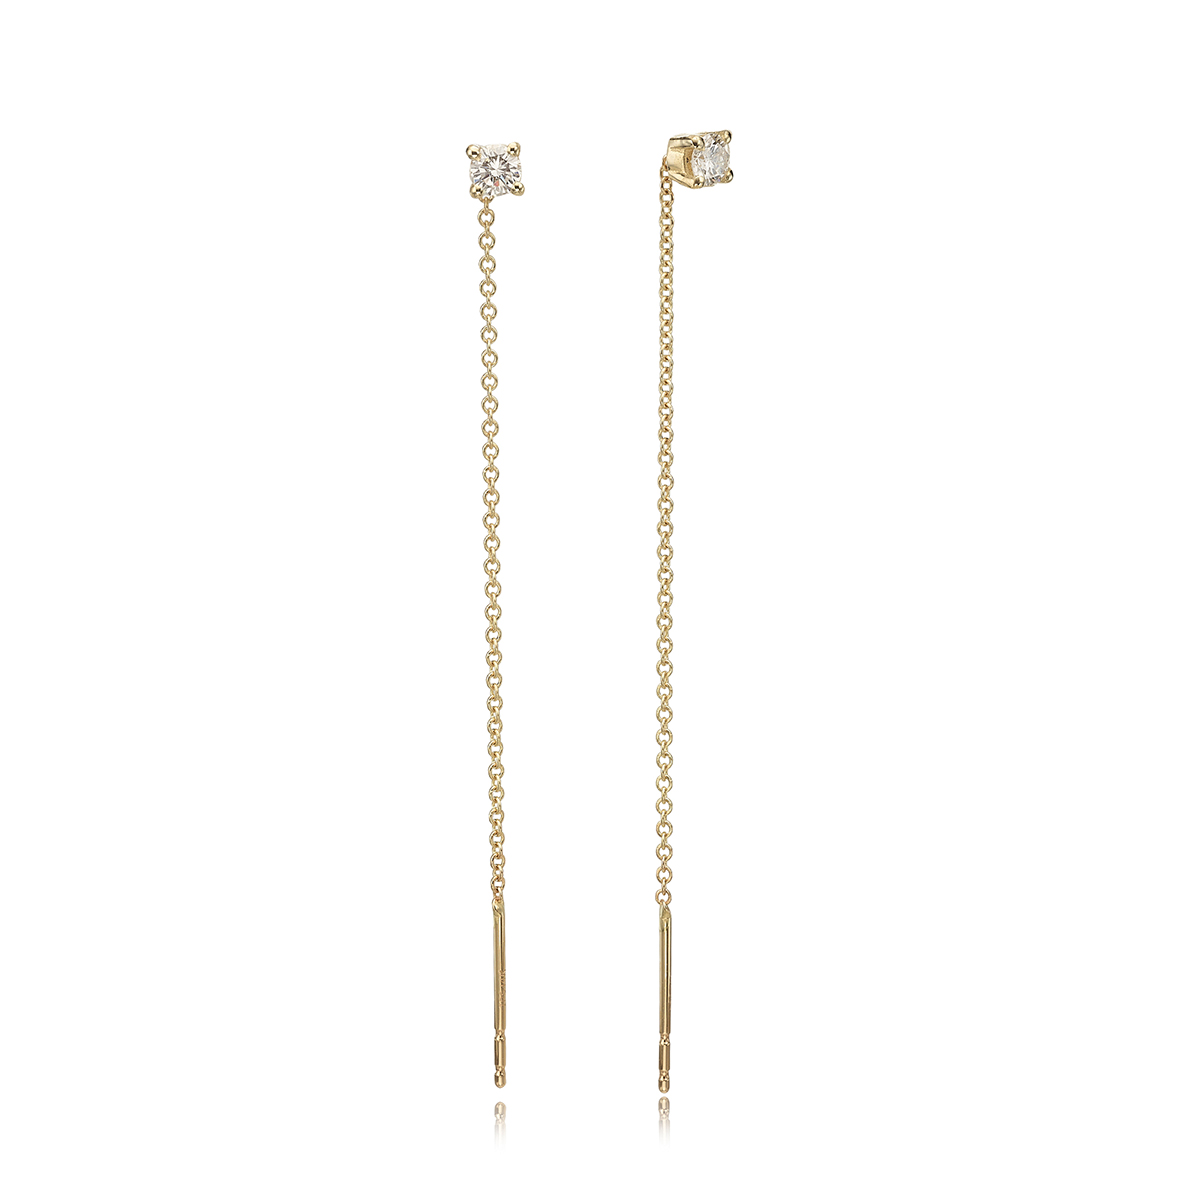 Diamond Chain Earrings – 0.20ct